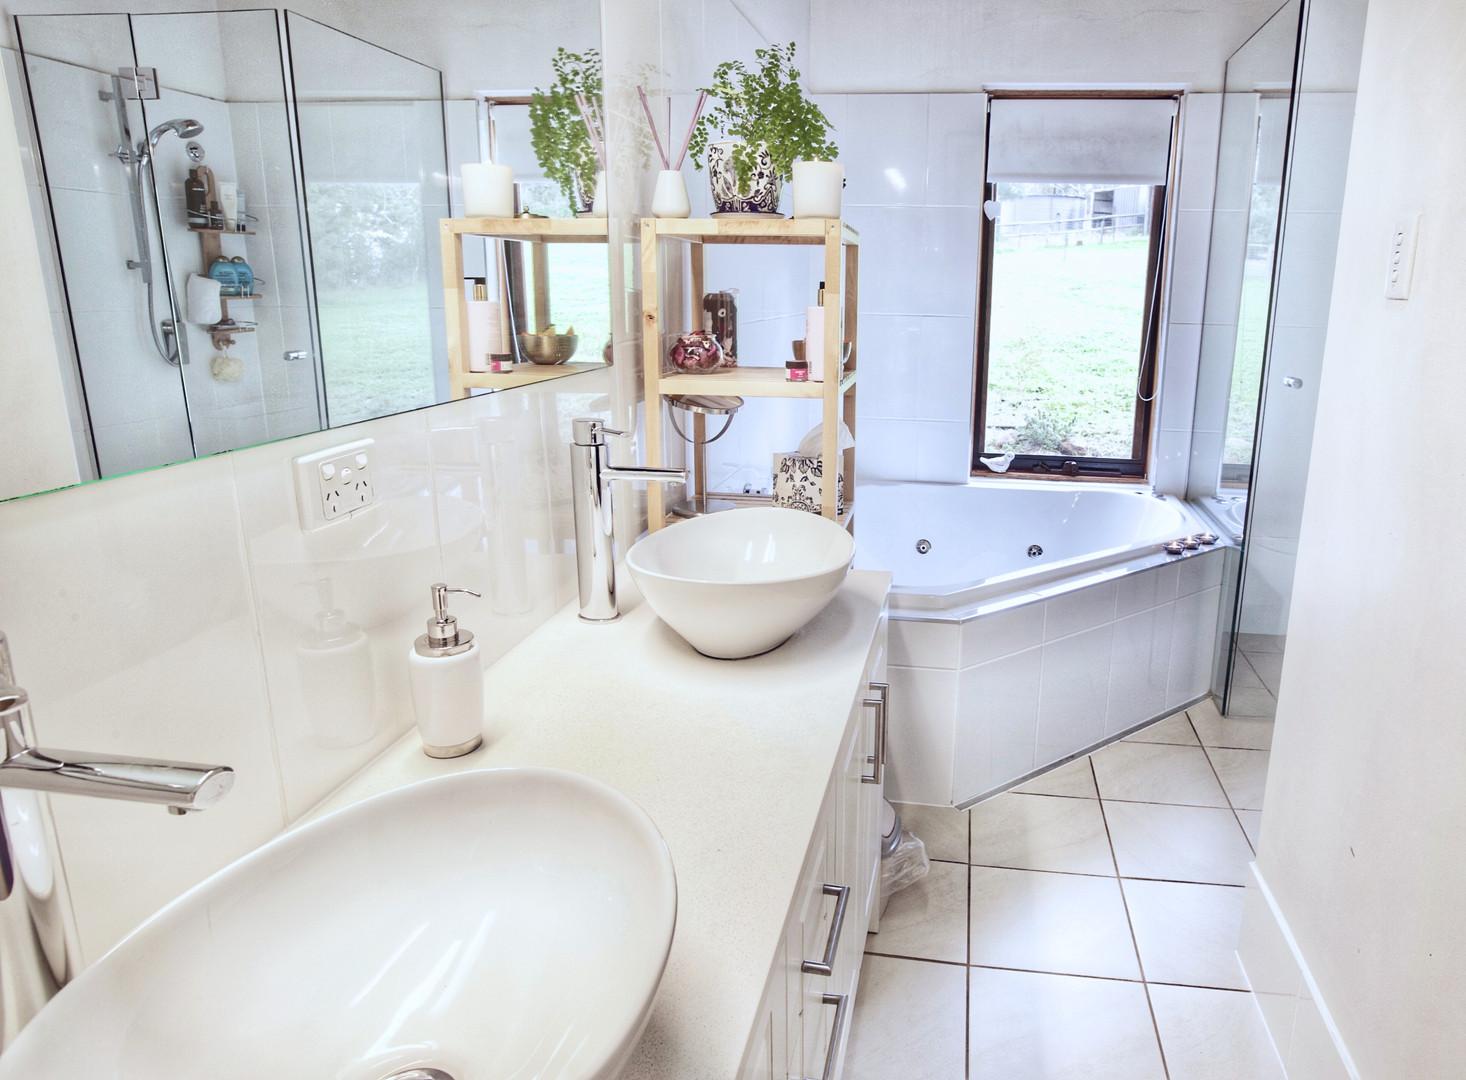 Modern renovated bathroom